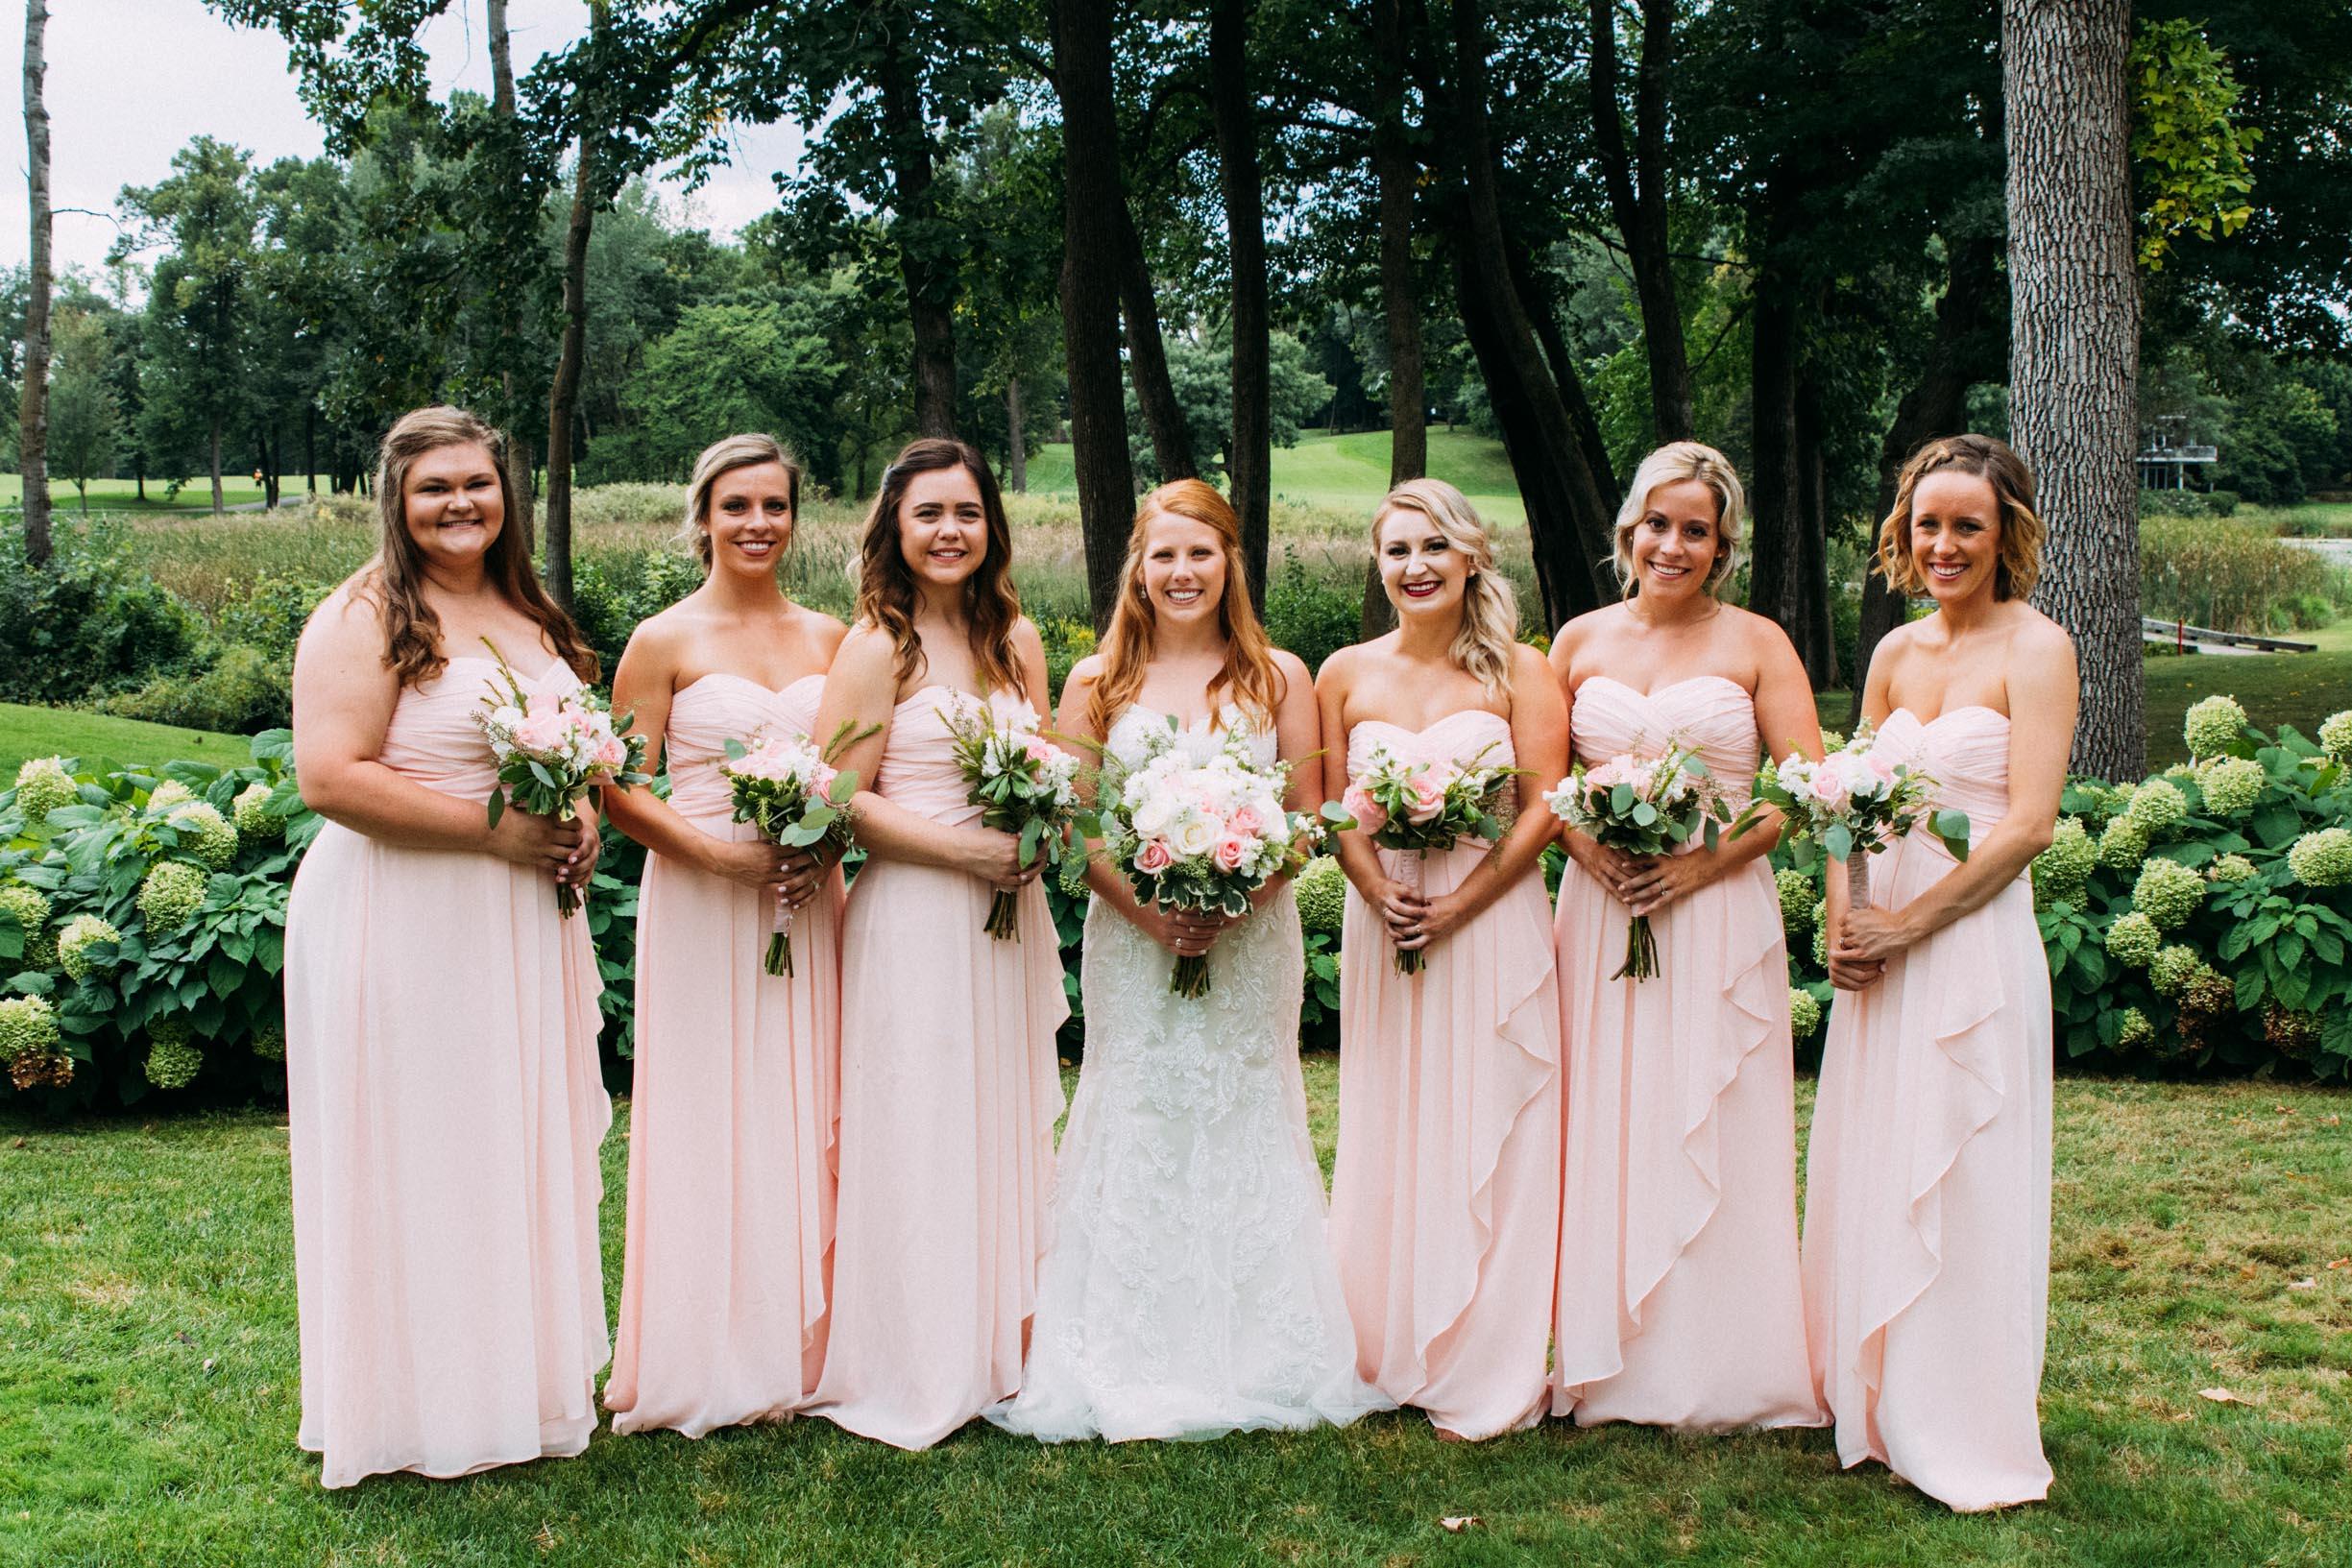 Megan_Zach_Minneapolis_Bearpath_Wedding_Blog-24.jpg